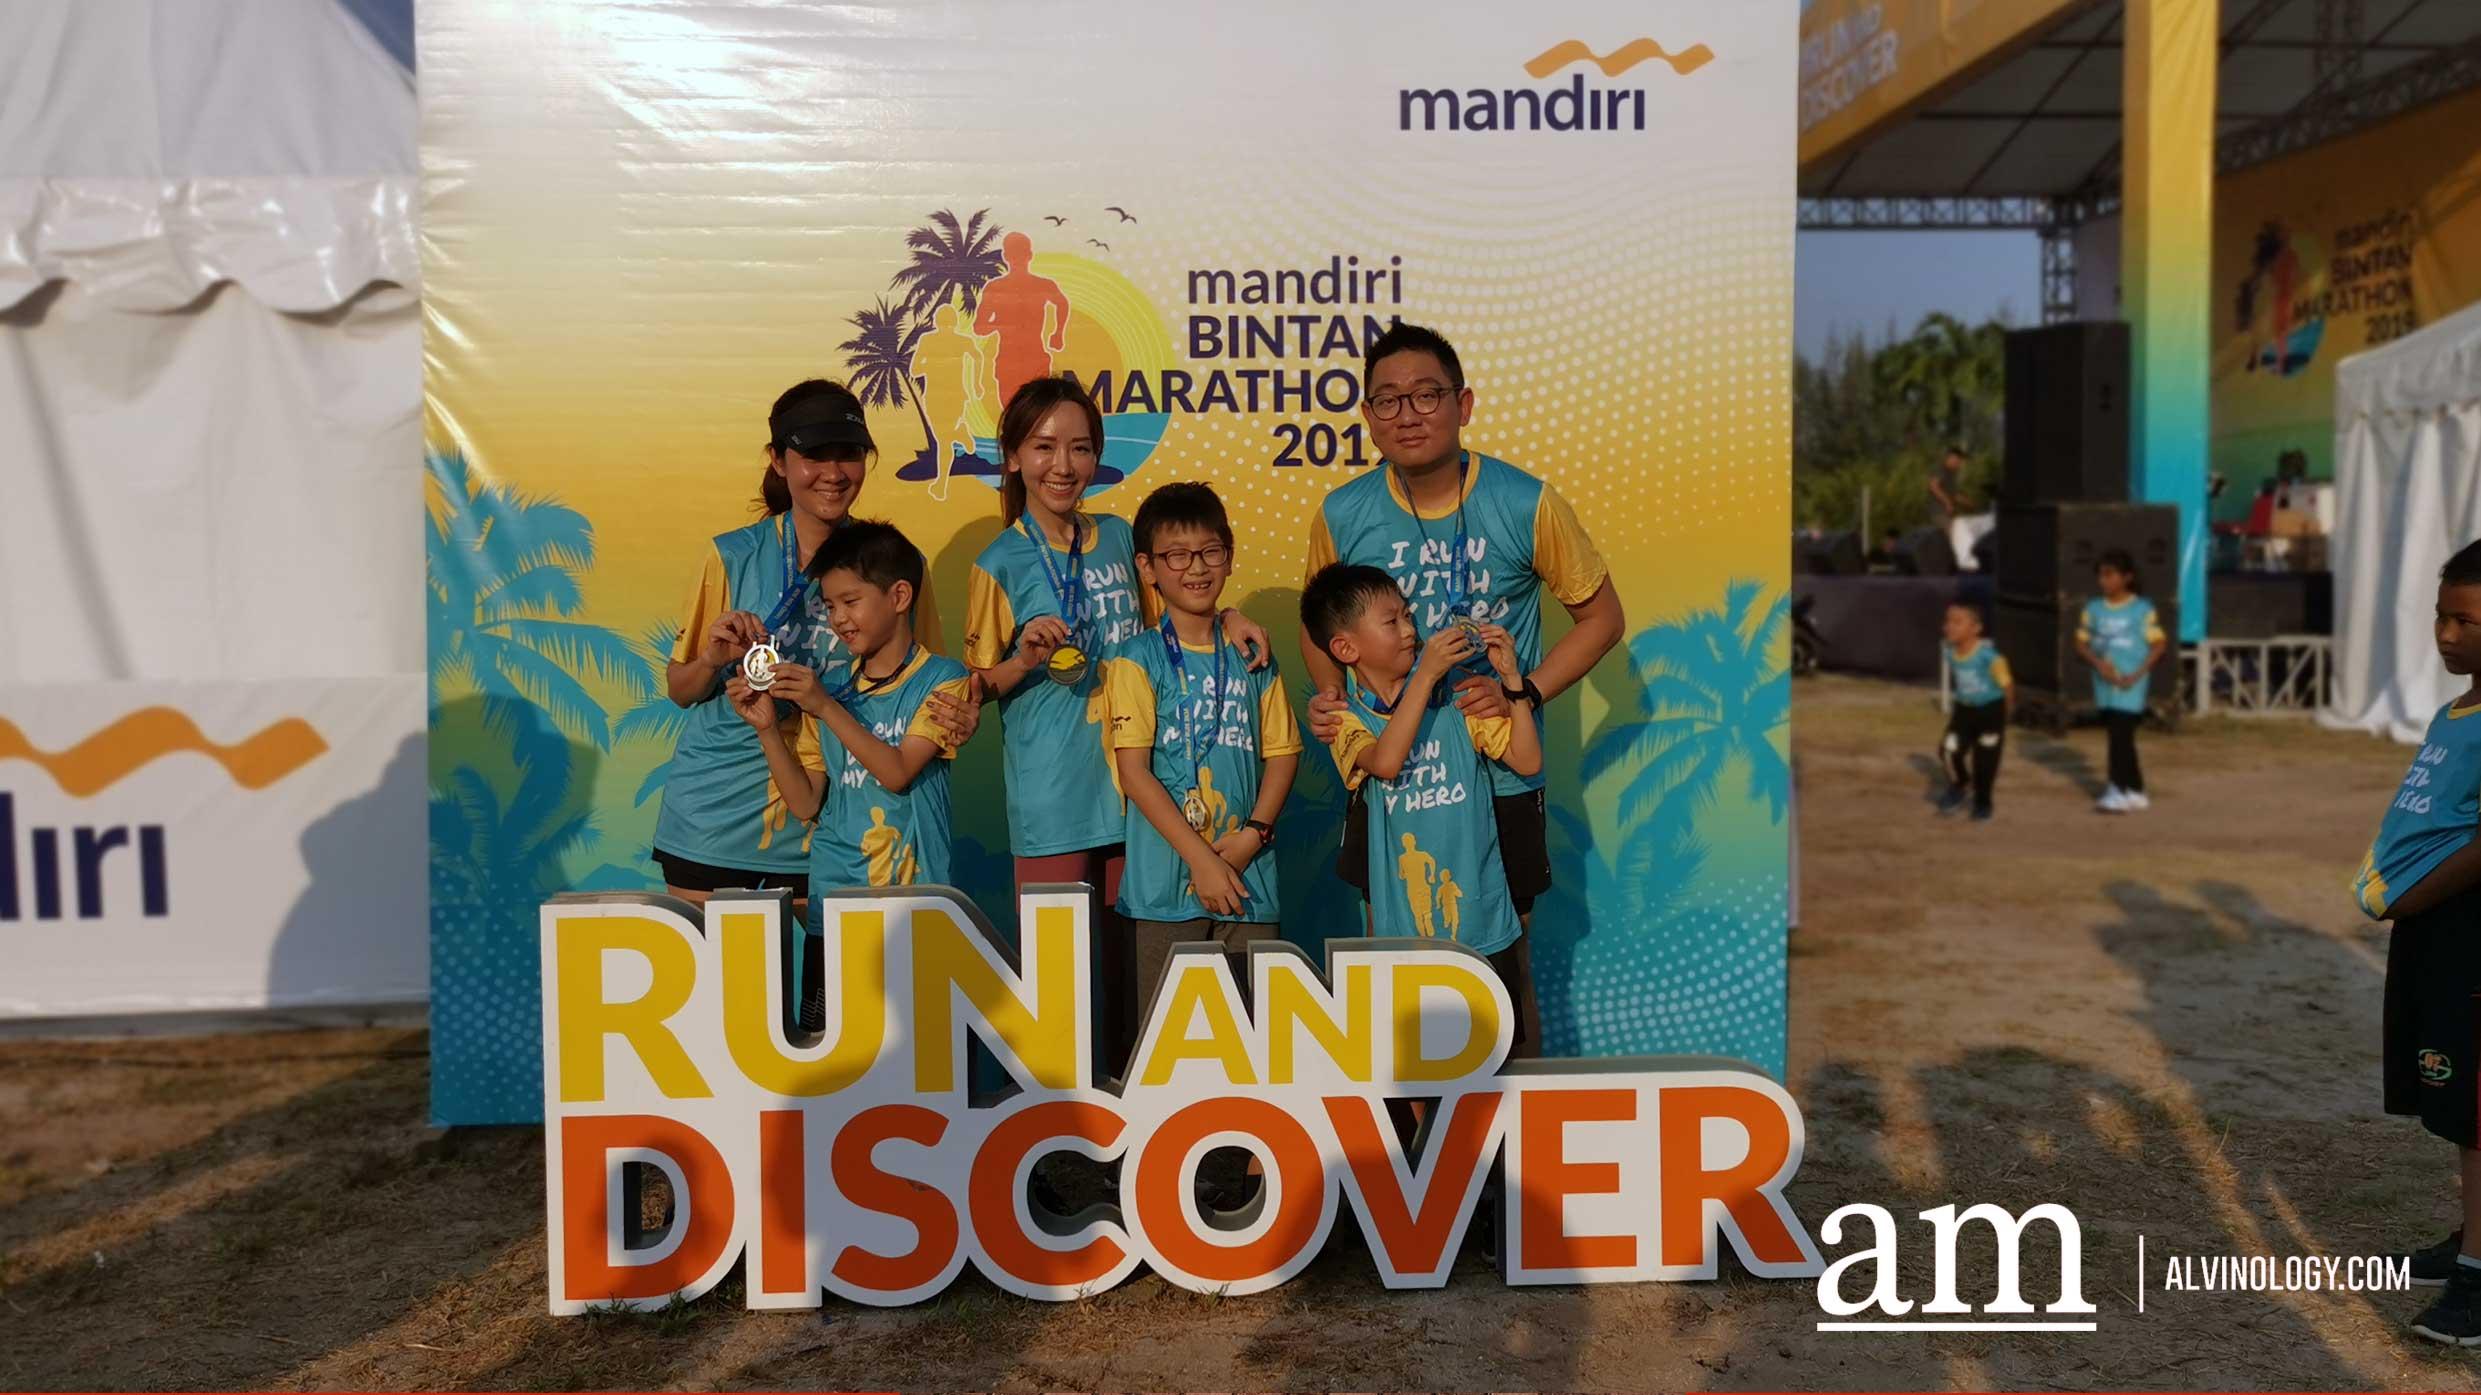 Mandiri Bintan Marathon kicks-off with over 3,000 participants from over 35 countries - Alvinology